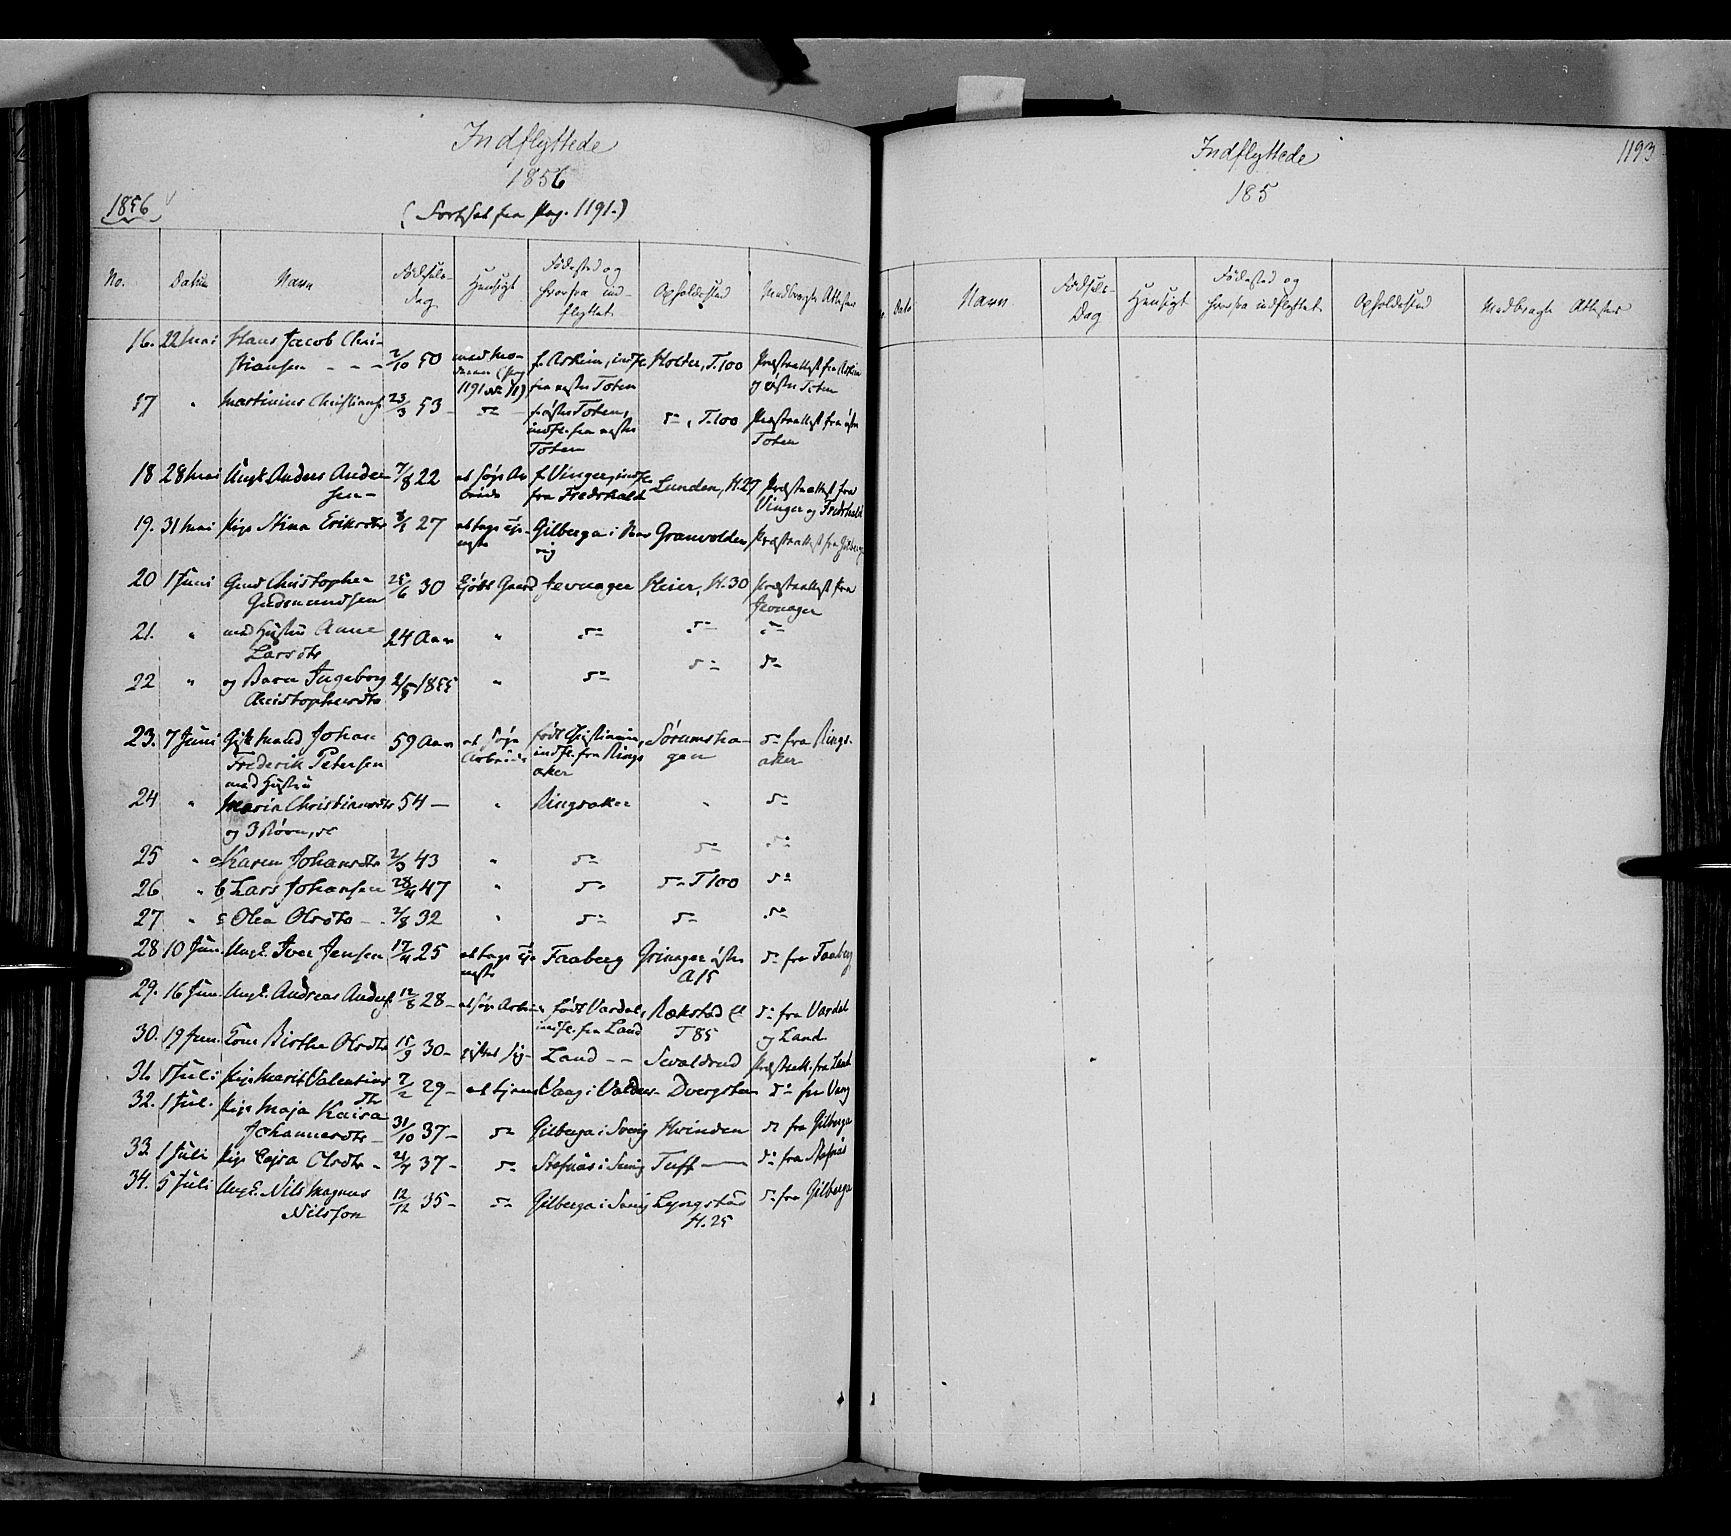 SAH, Gran prestekontor, Ministerialbok nr. 11, 1842-1856, s. 1192-1193